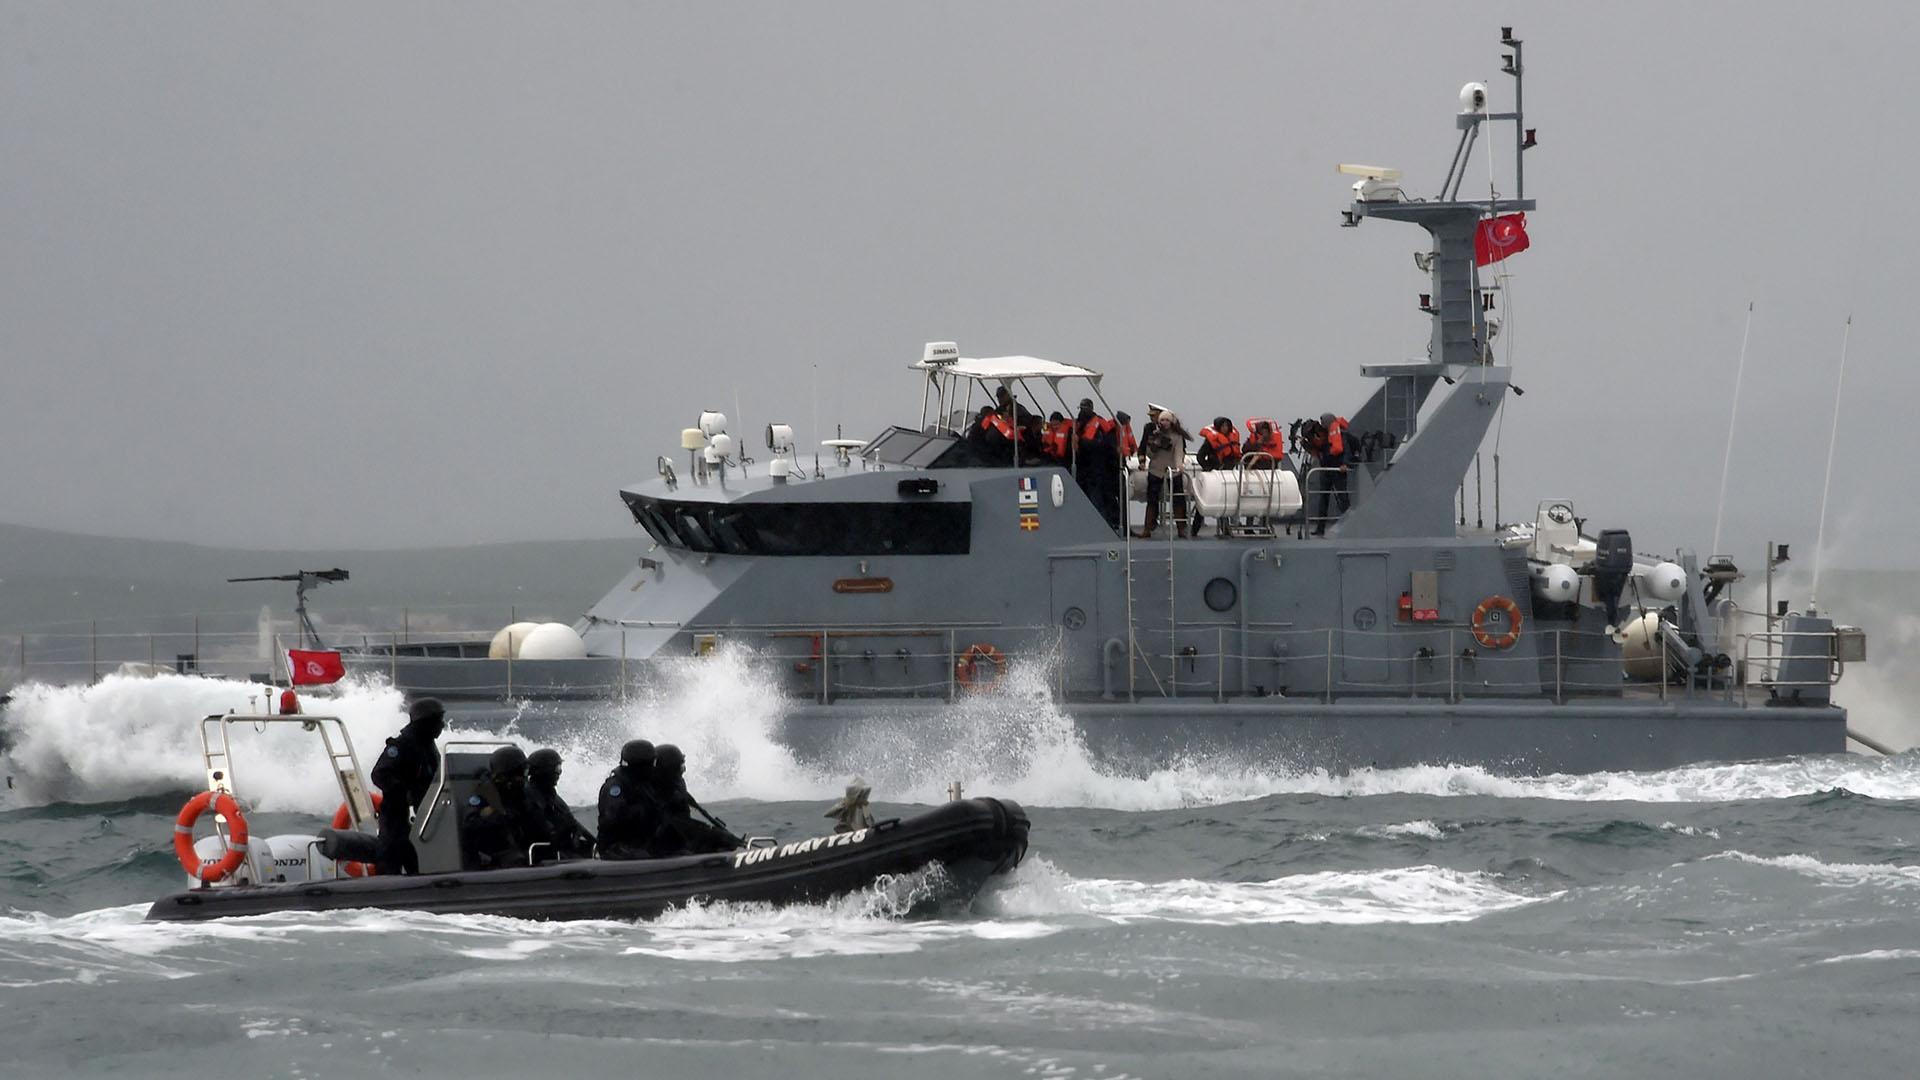 Photo of البحرية الملكية تقدم المساعدة لحوالي 330 مرشحا للهجرة السرية